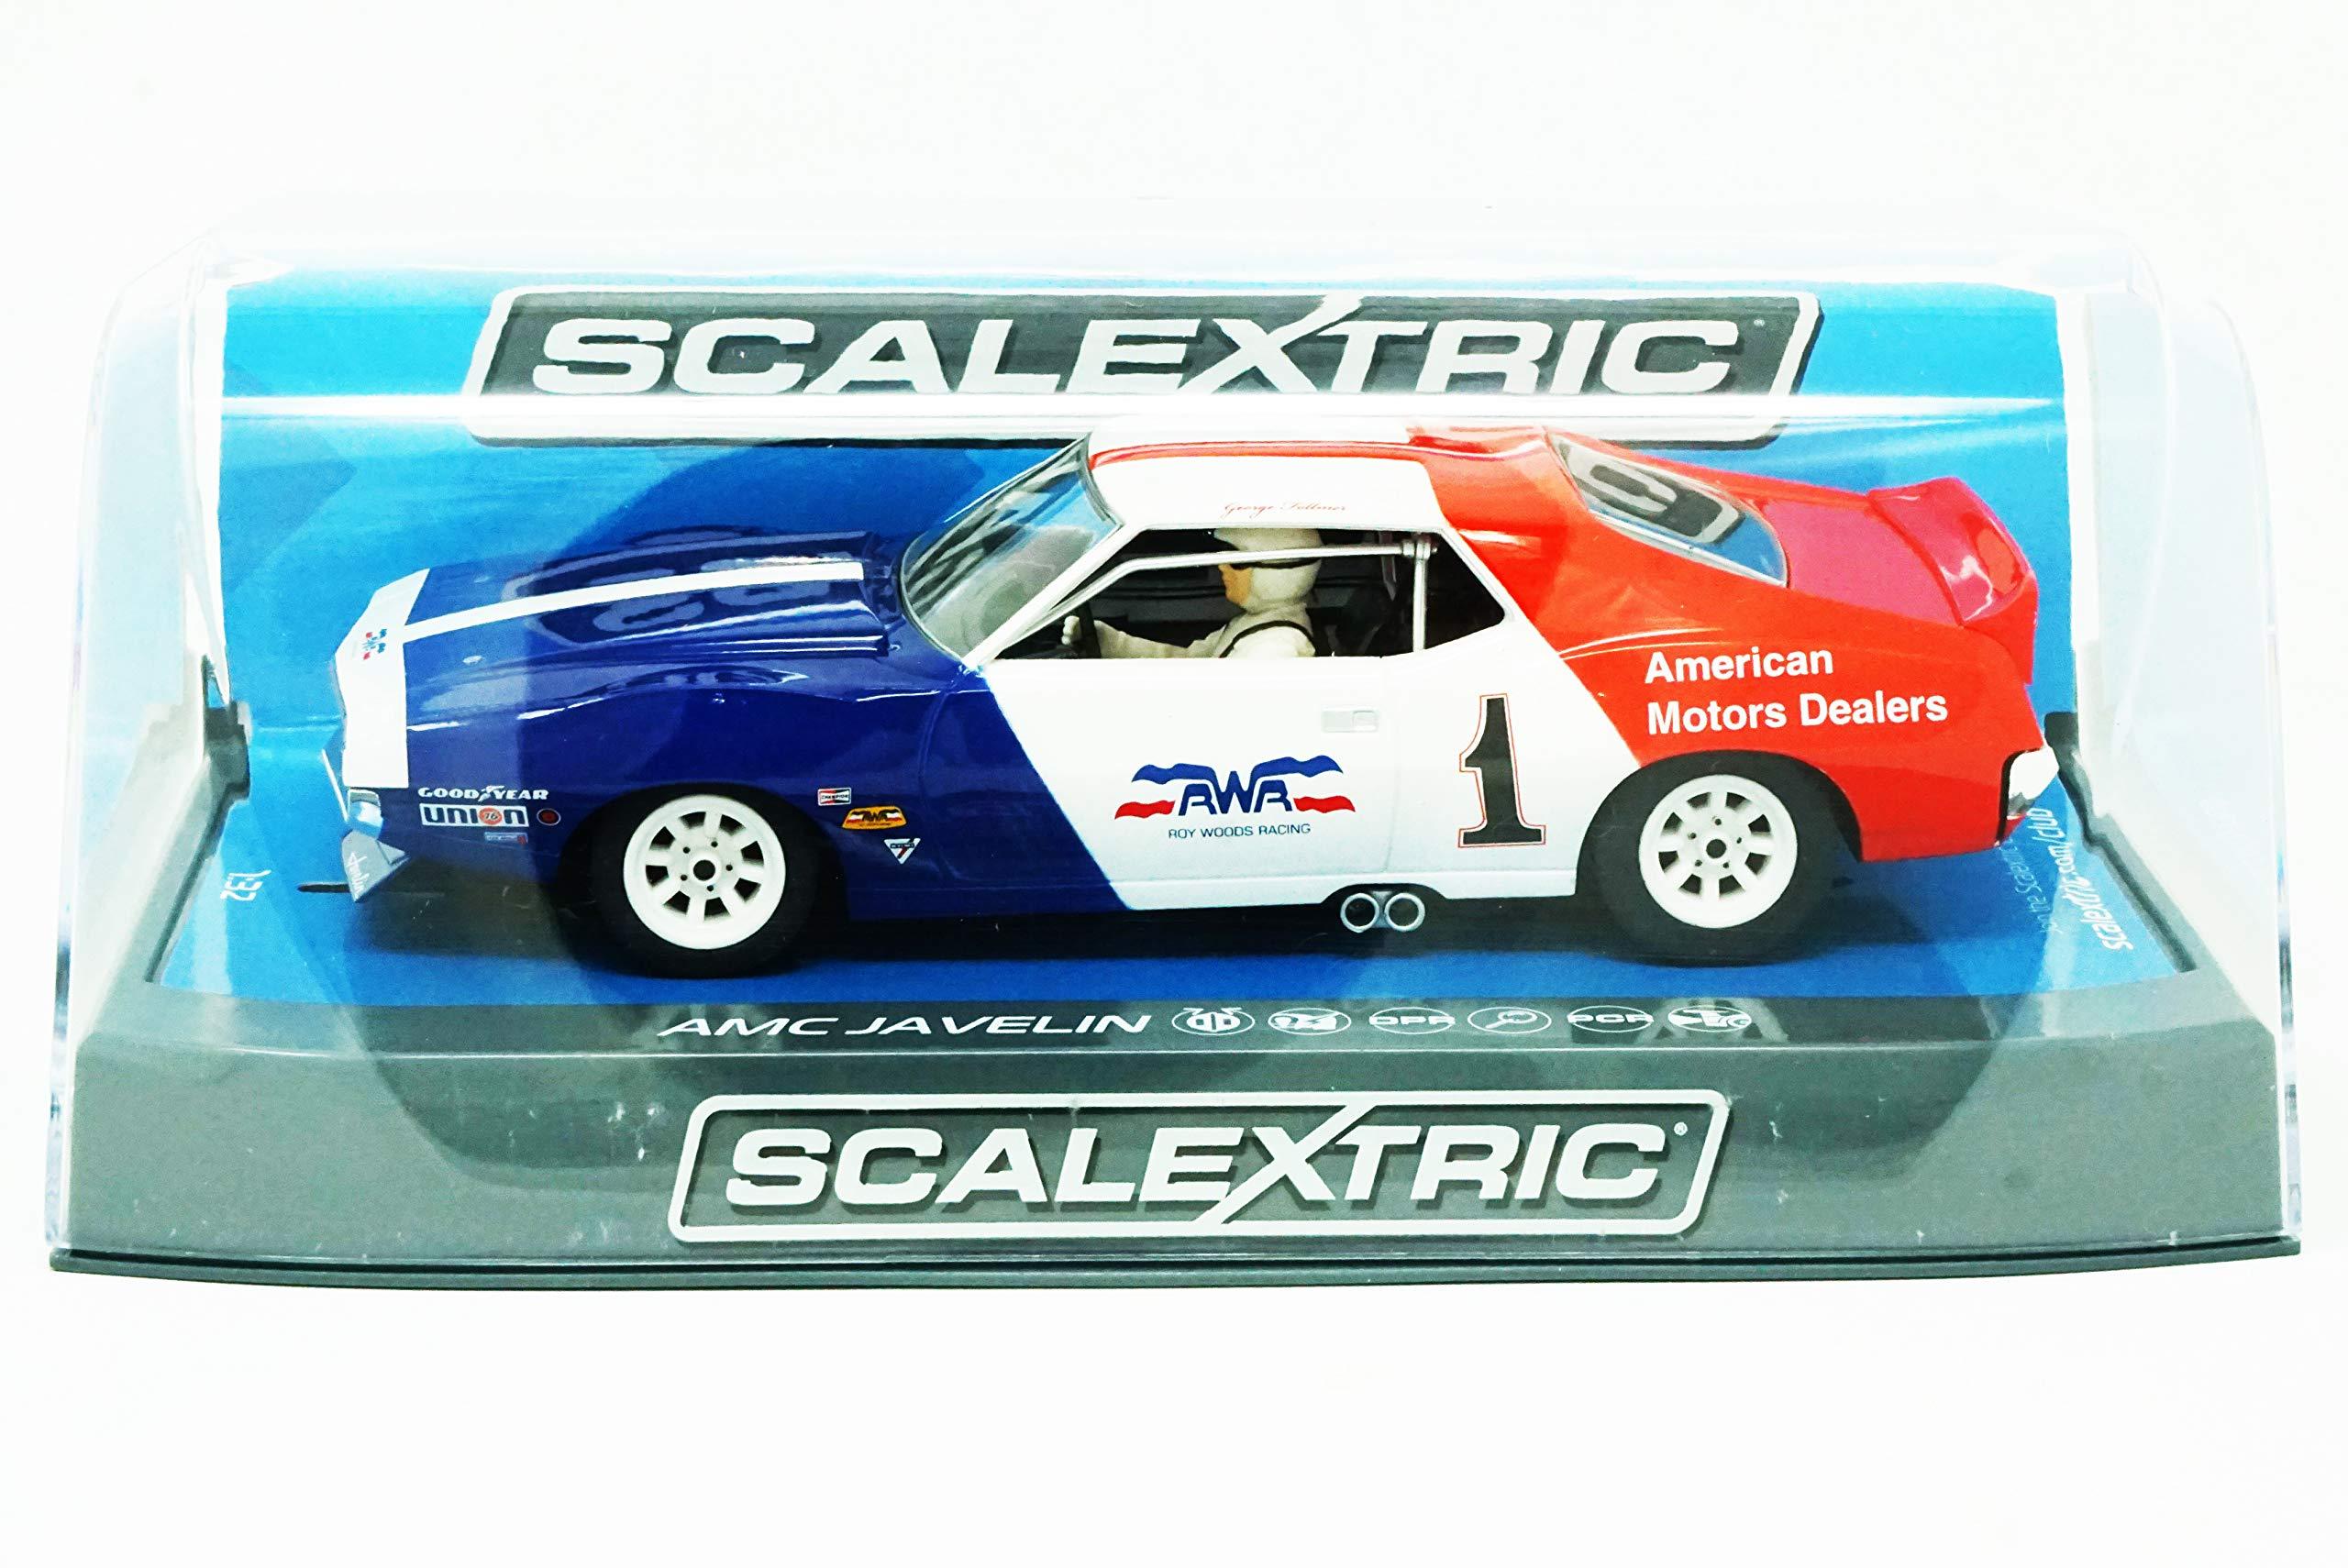 Scalextric AMC Javelin Trans Am George Follmer #1 1:32 Slot Car C3875 Vehicle Replicas